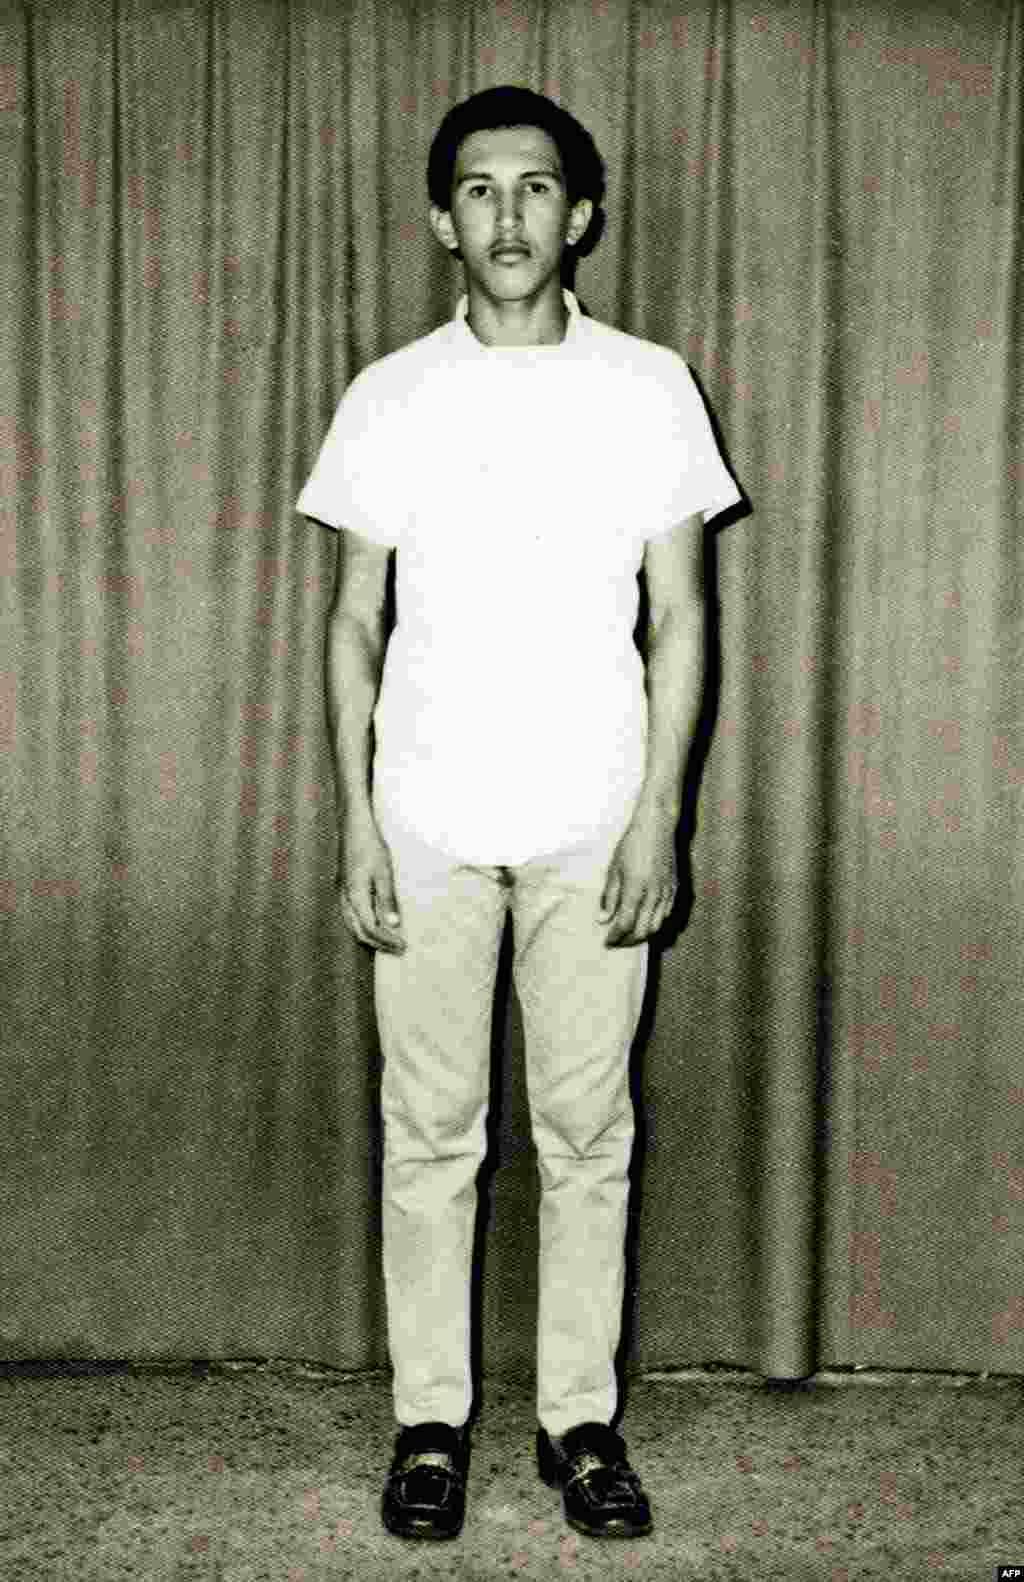 Hugo Chavez hərbi akademiyada. Karacas 1971